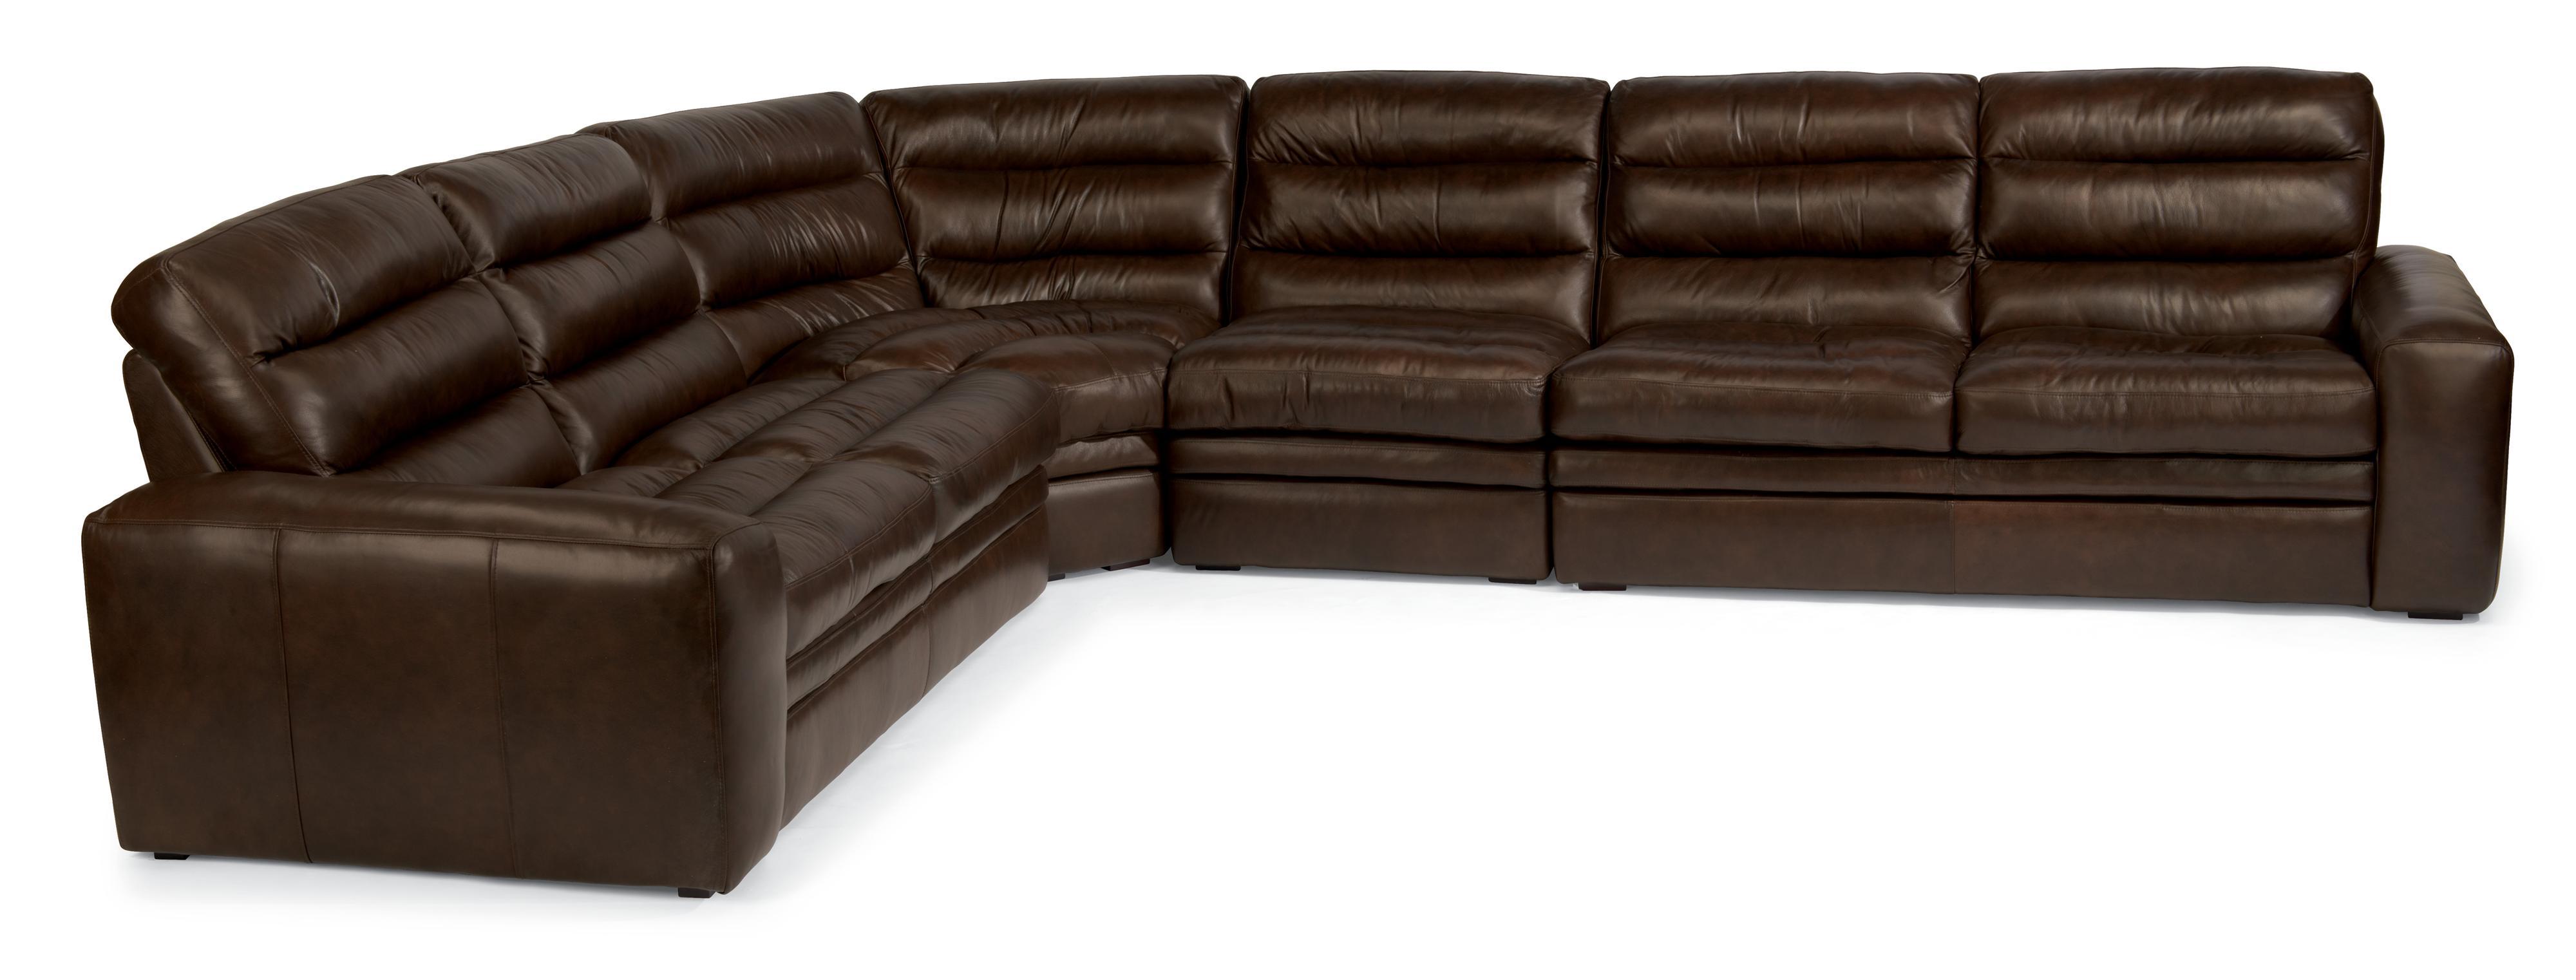 Flexsteel Latitudes - Mariah 5 Pc Sectional Sofa - Item Number: 1451-27+2x19+1451-23+1451-28-740-70